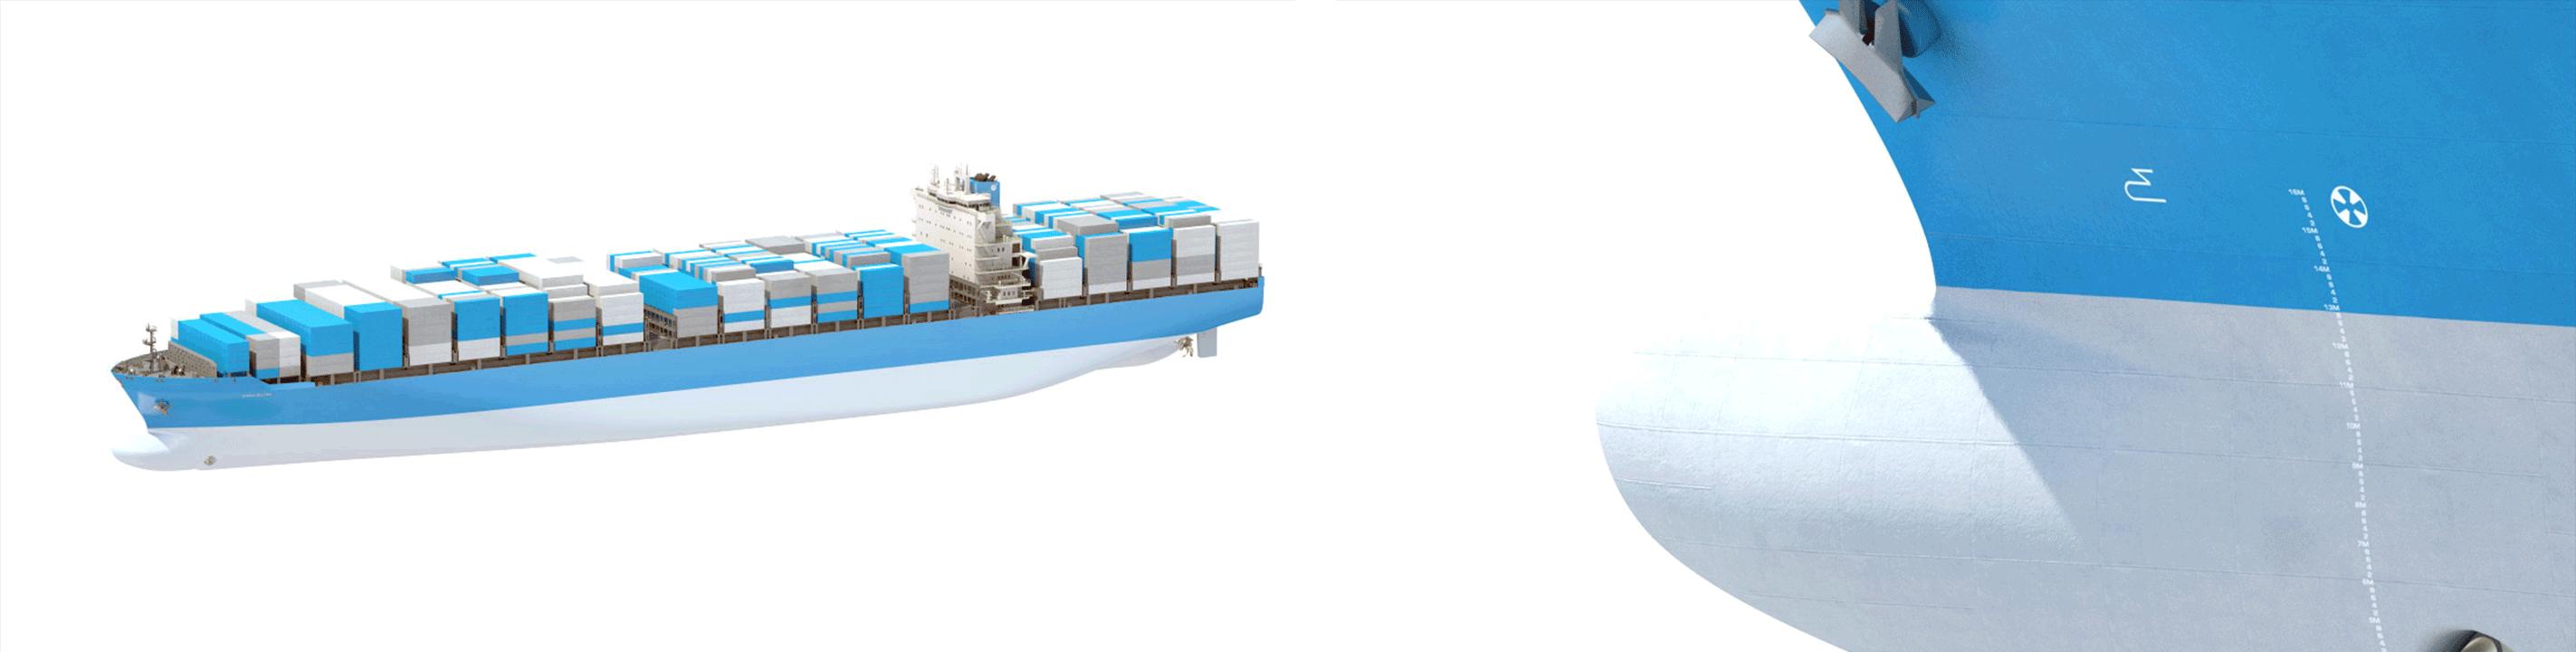 Ship_modeling_crop